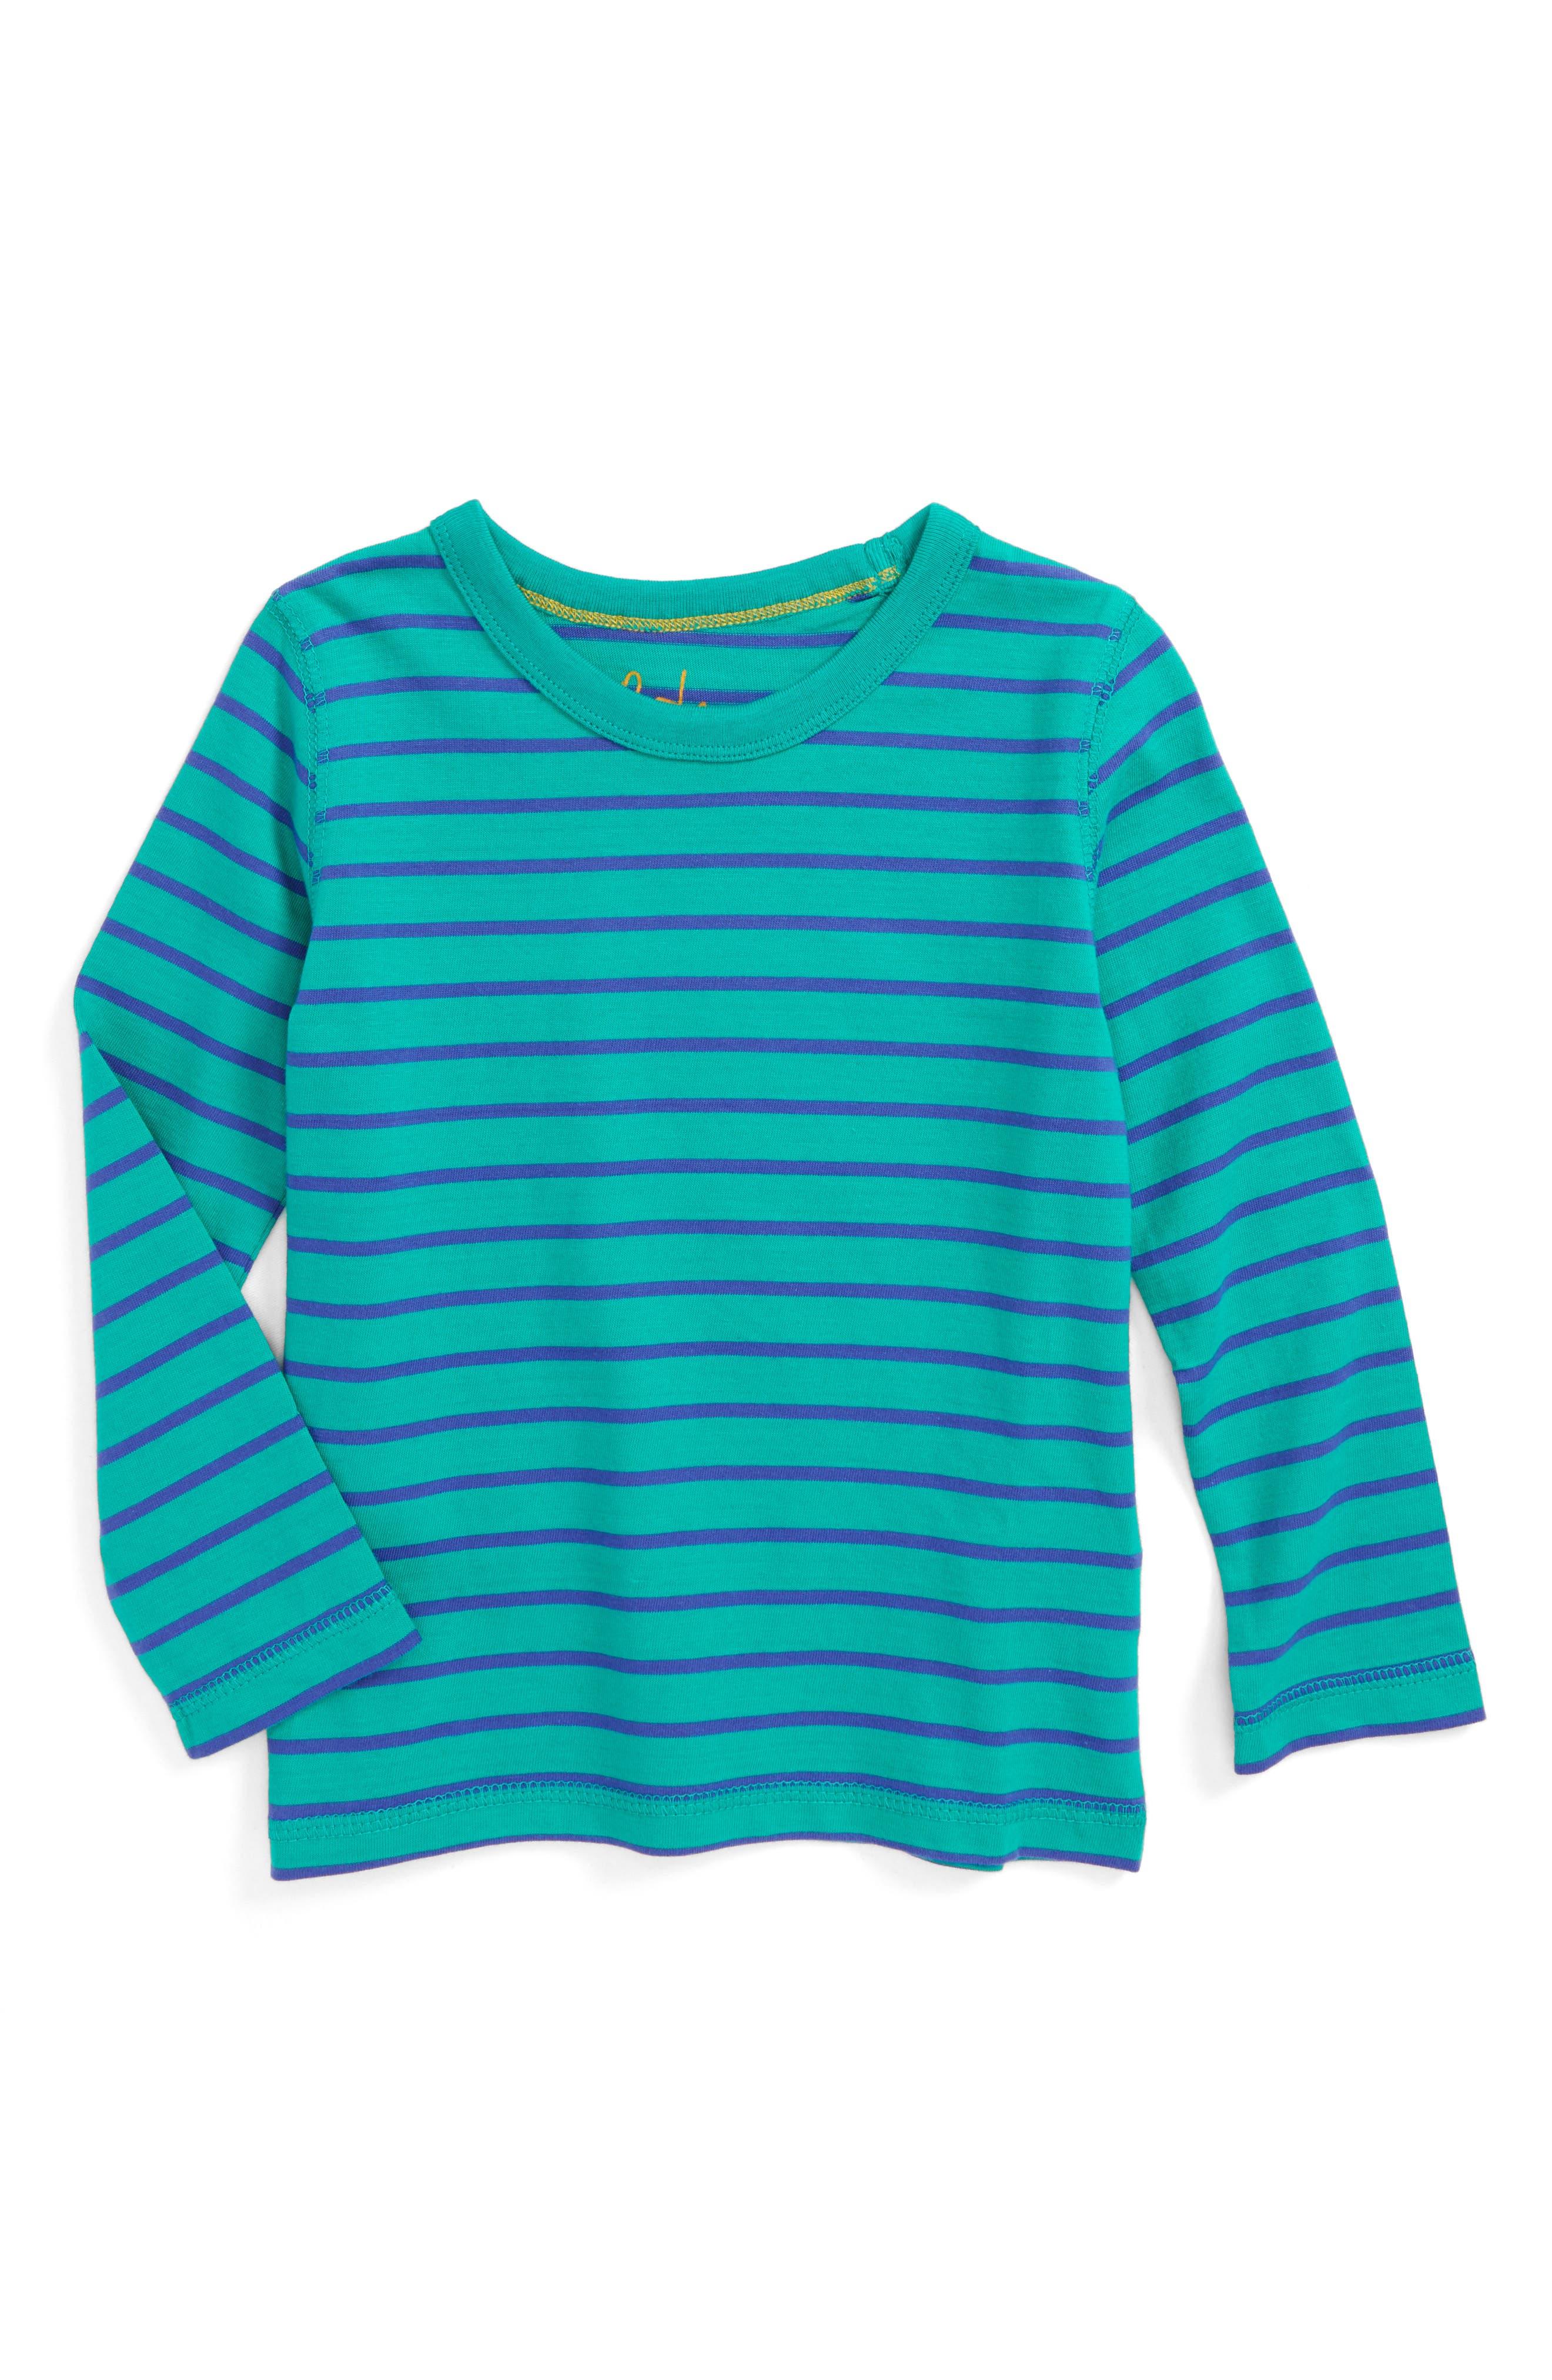 Supersoft Stripe T-Shirt,                             Main thumbnail 1, color,                             Wild Green/ Gymnasium Blue